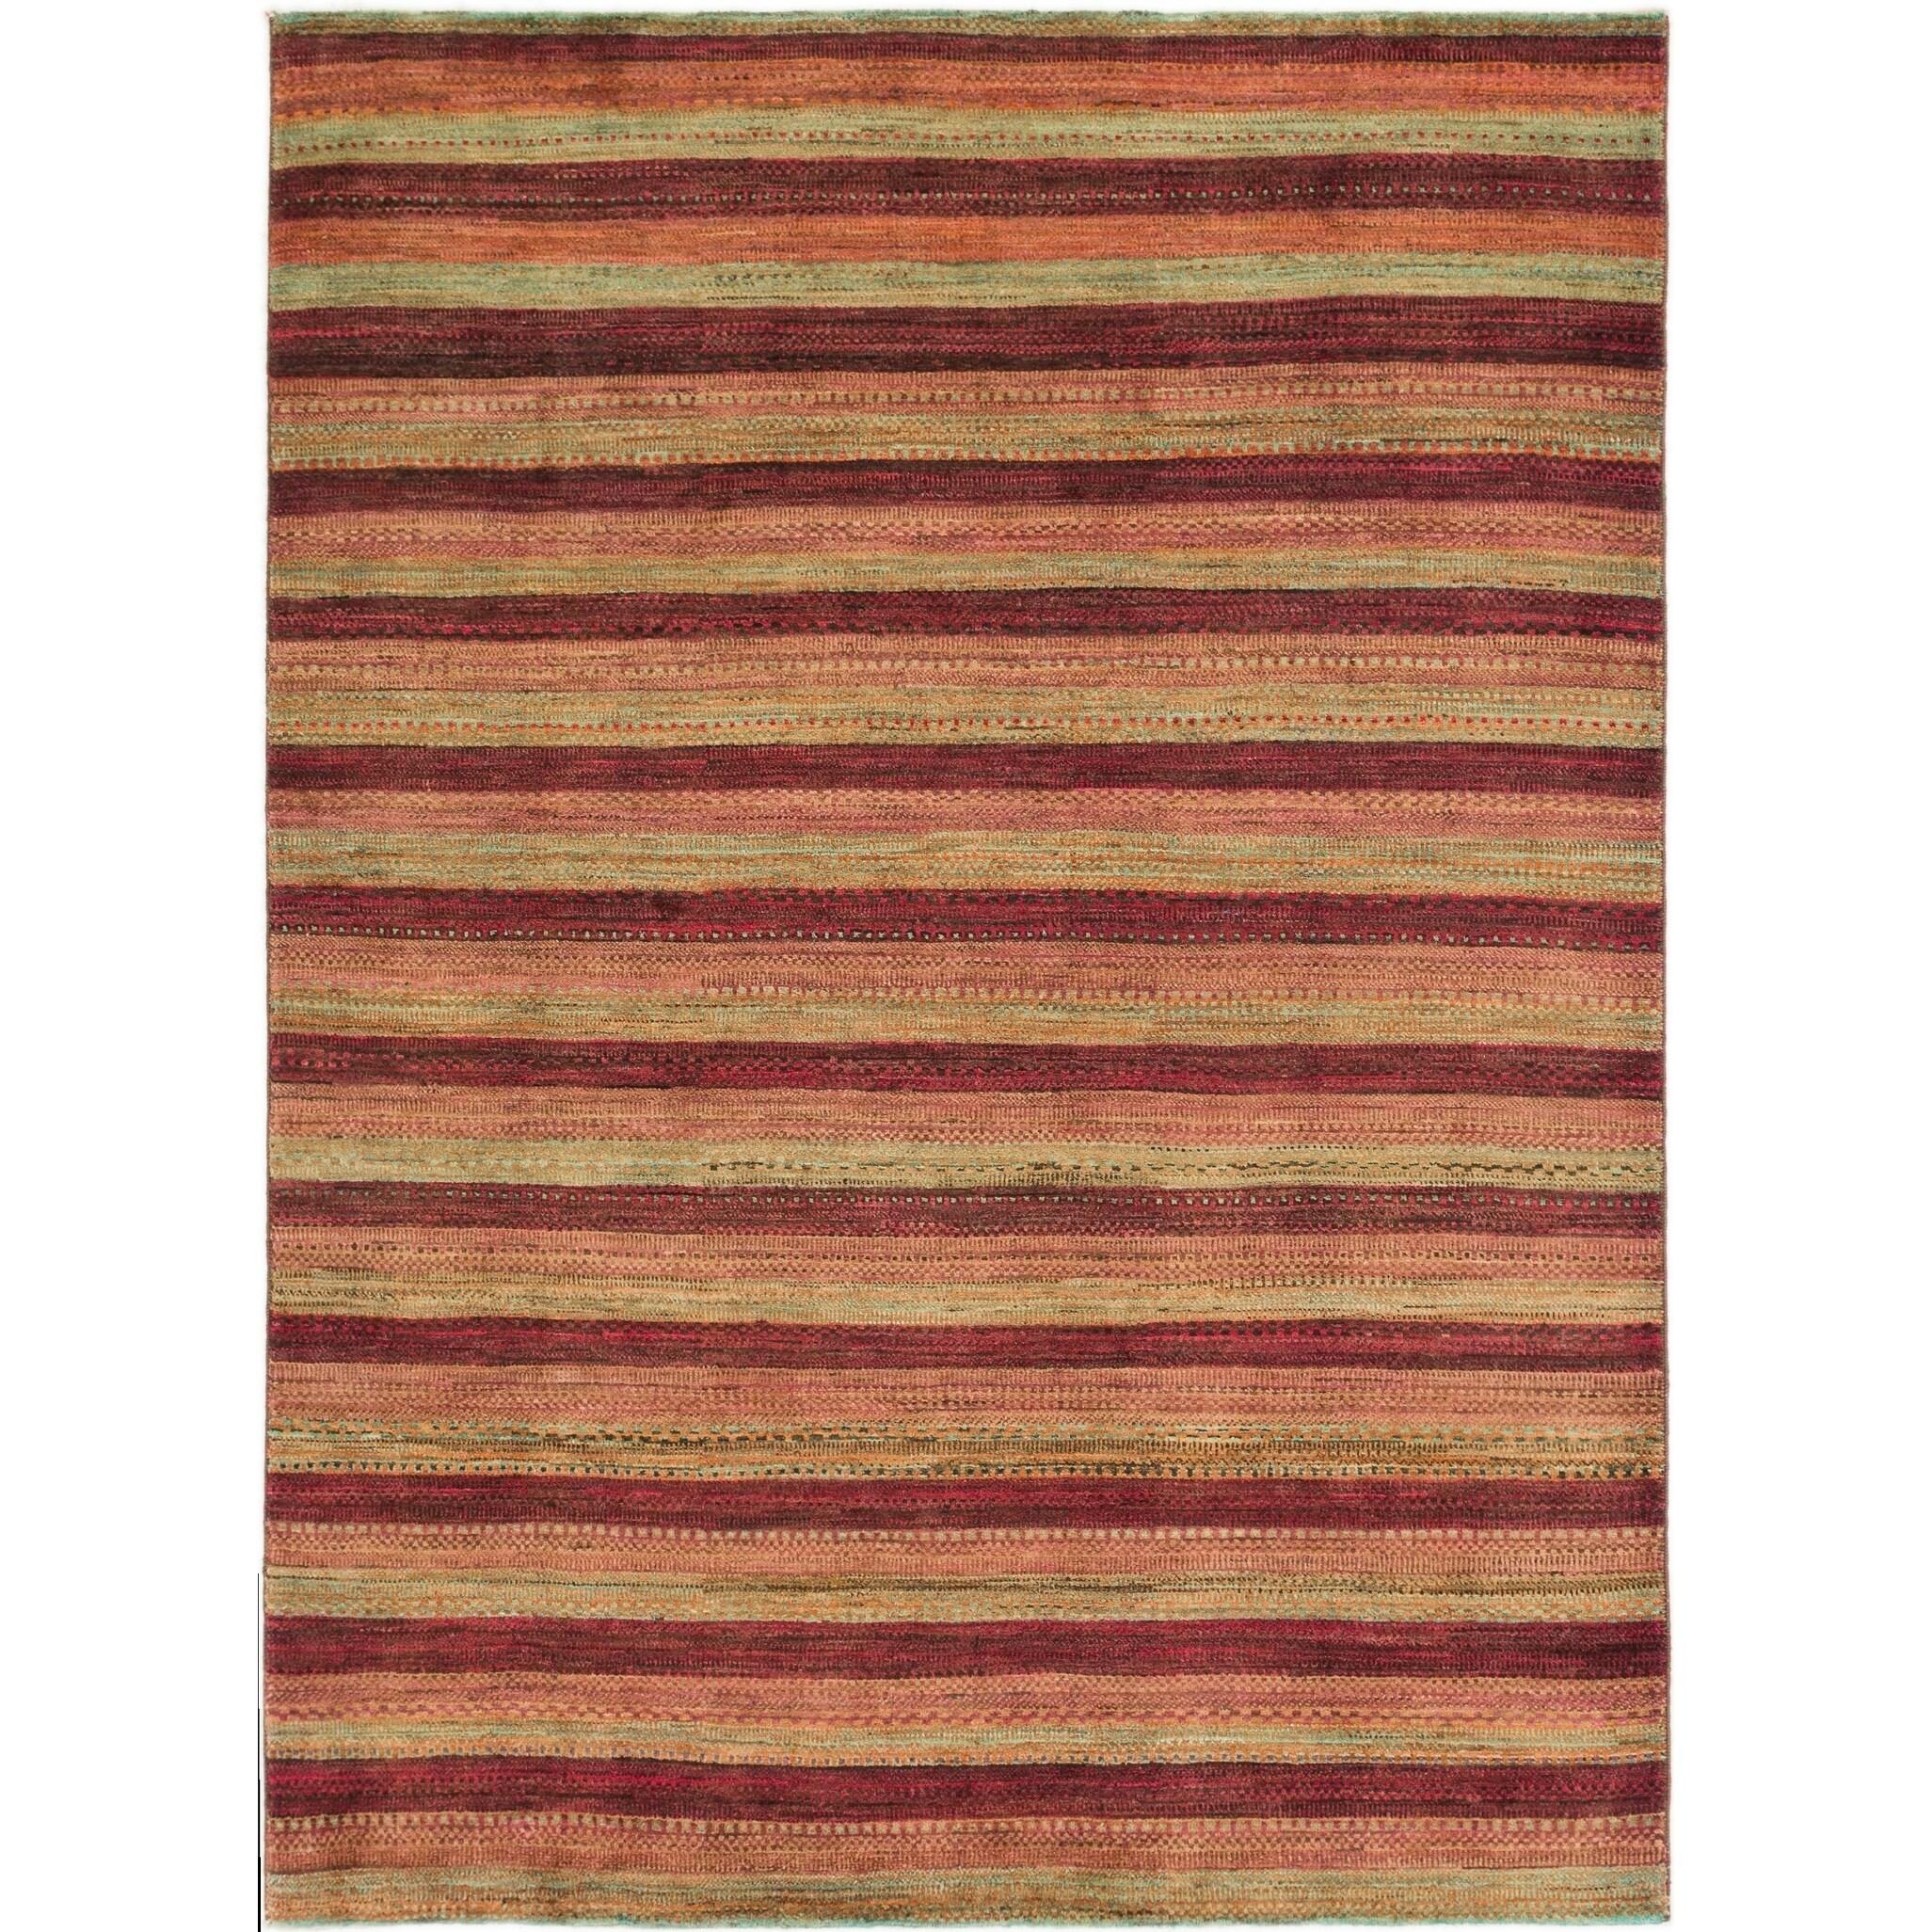 Hand Knotted Kashkuli Gabbeh Wool Area Rug - 6 2 x 8 5 (Multi - 6 2 x 8 5)